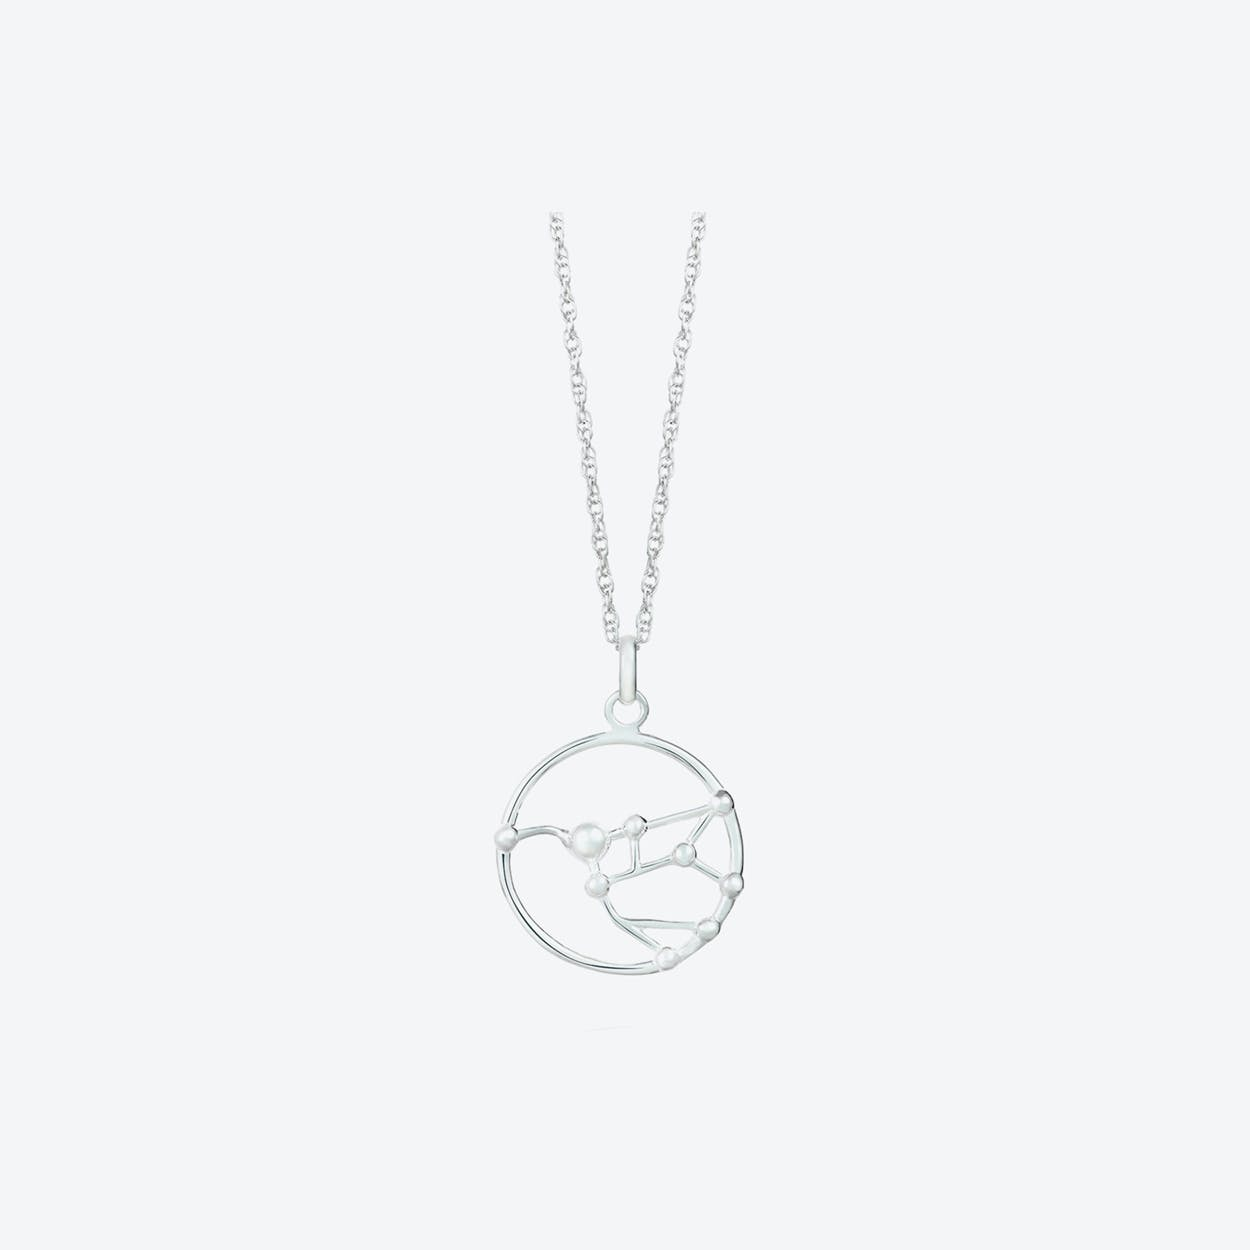 Ursa Major Astrology Necklace